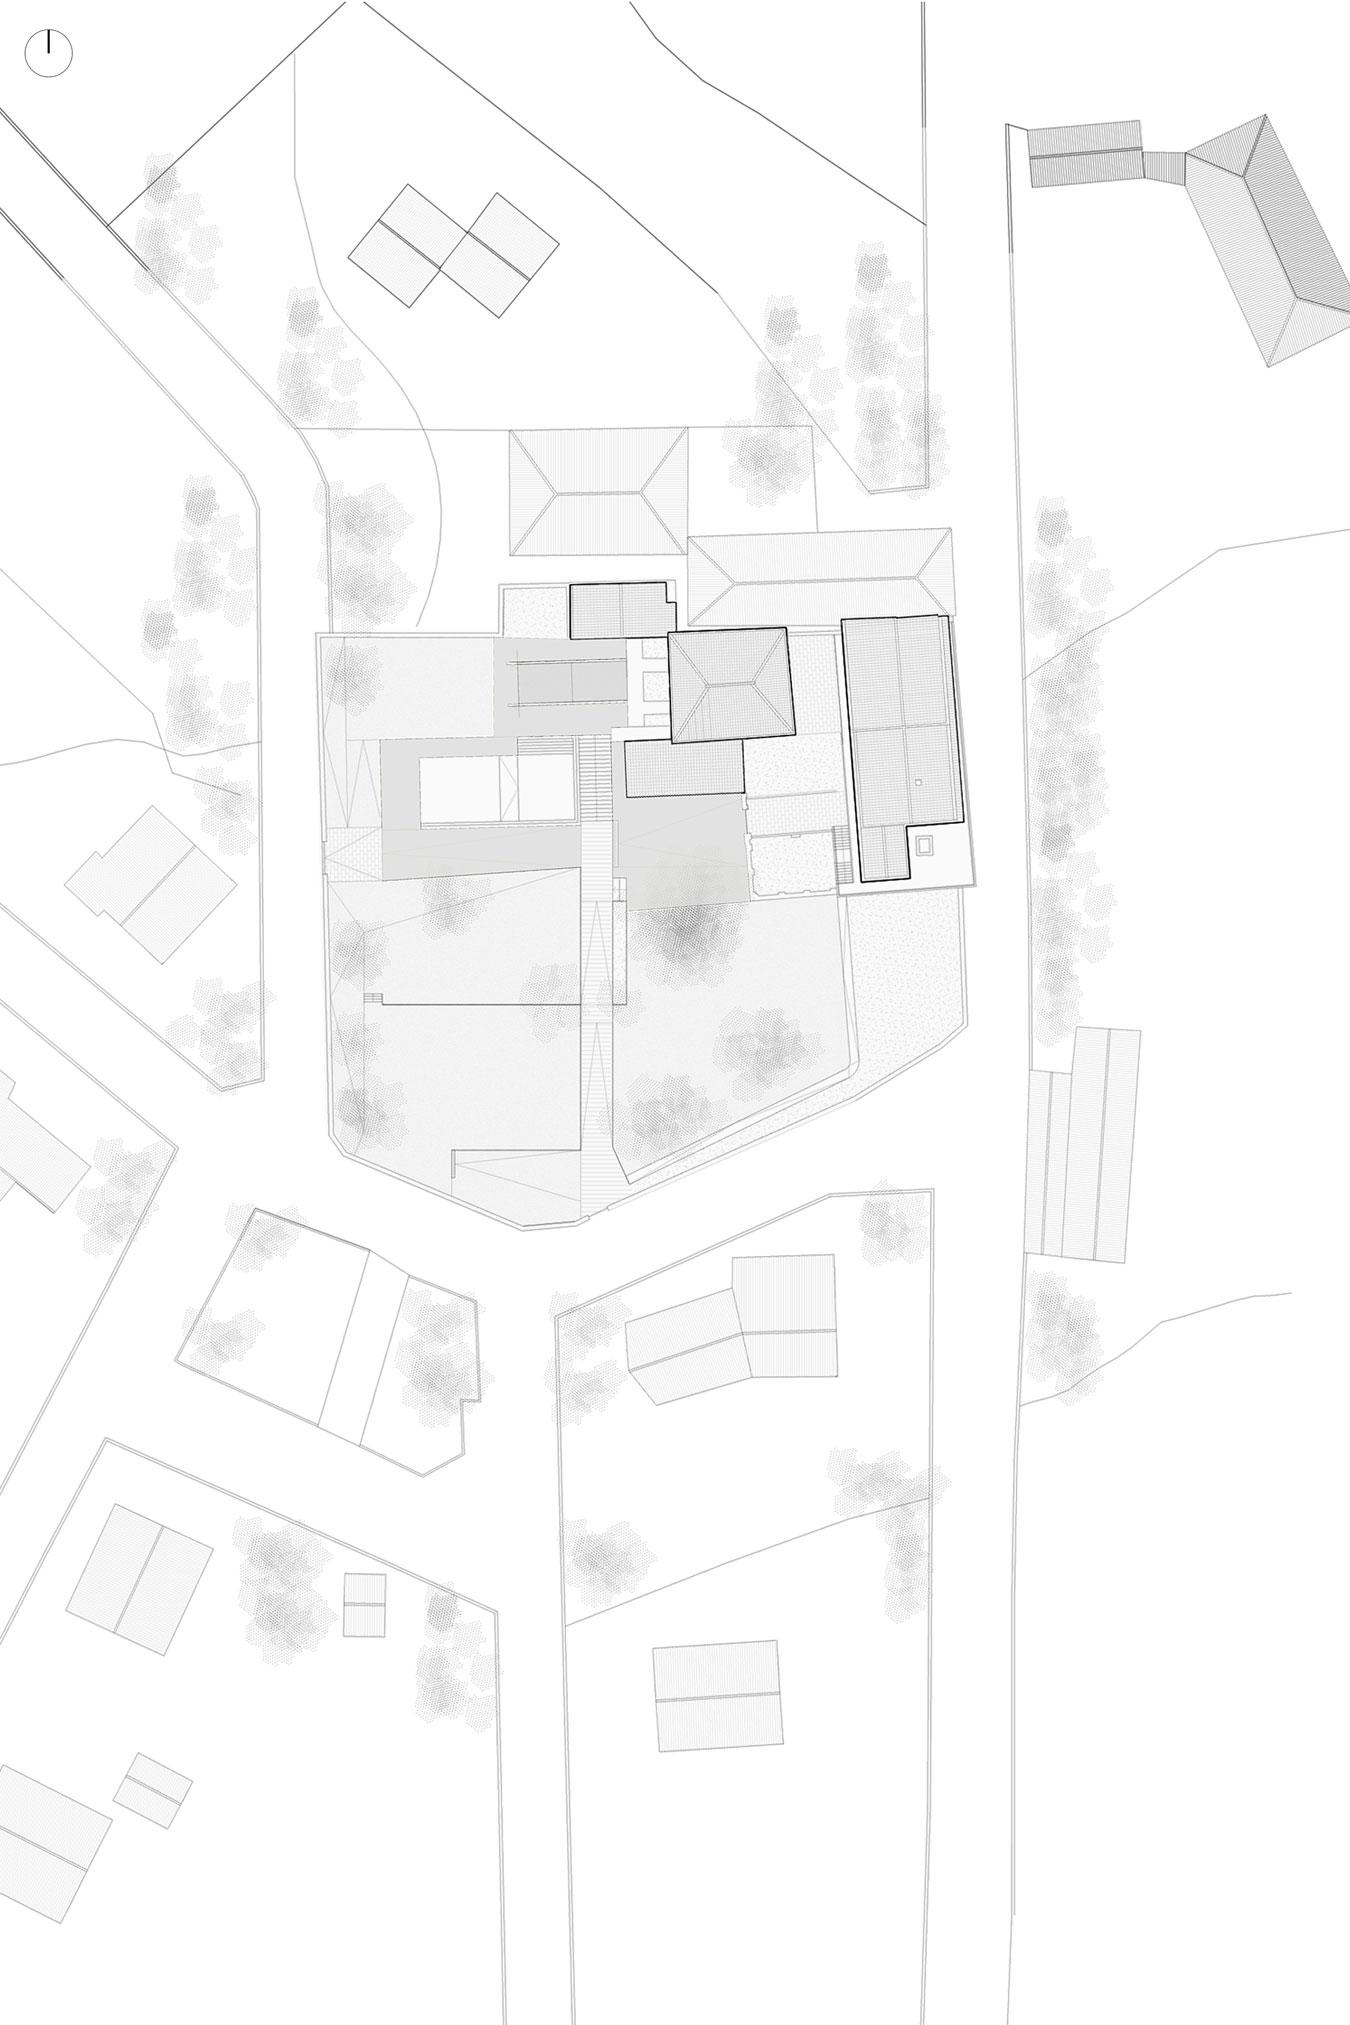 CRV House in Viagrande by ACA Amore Campione Architettura-33